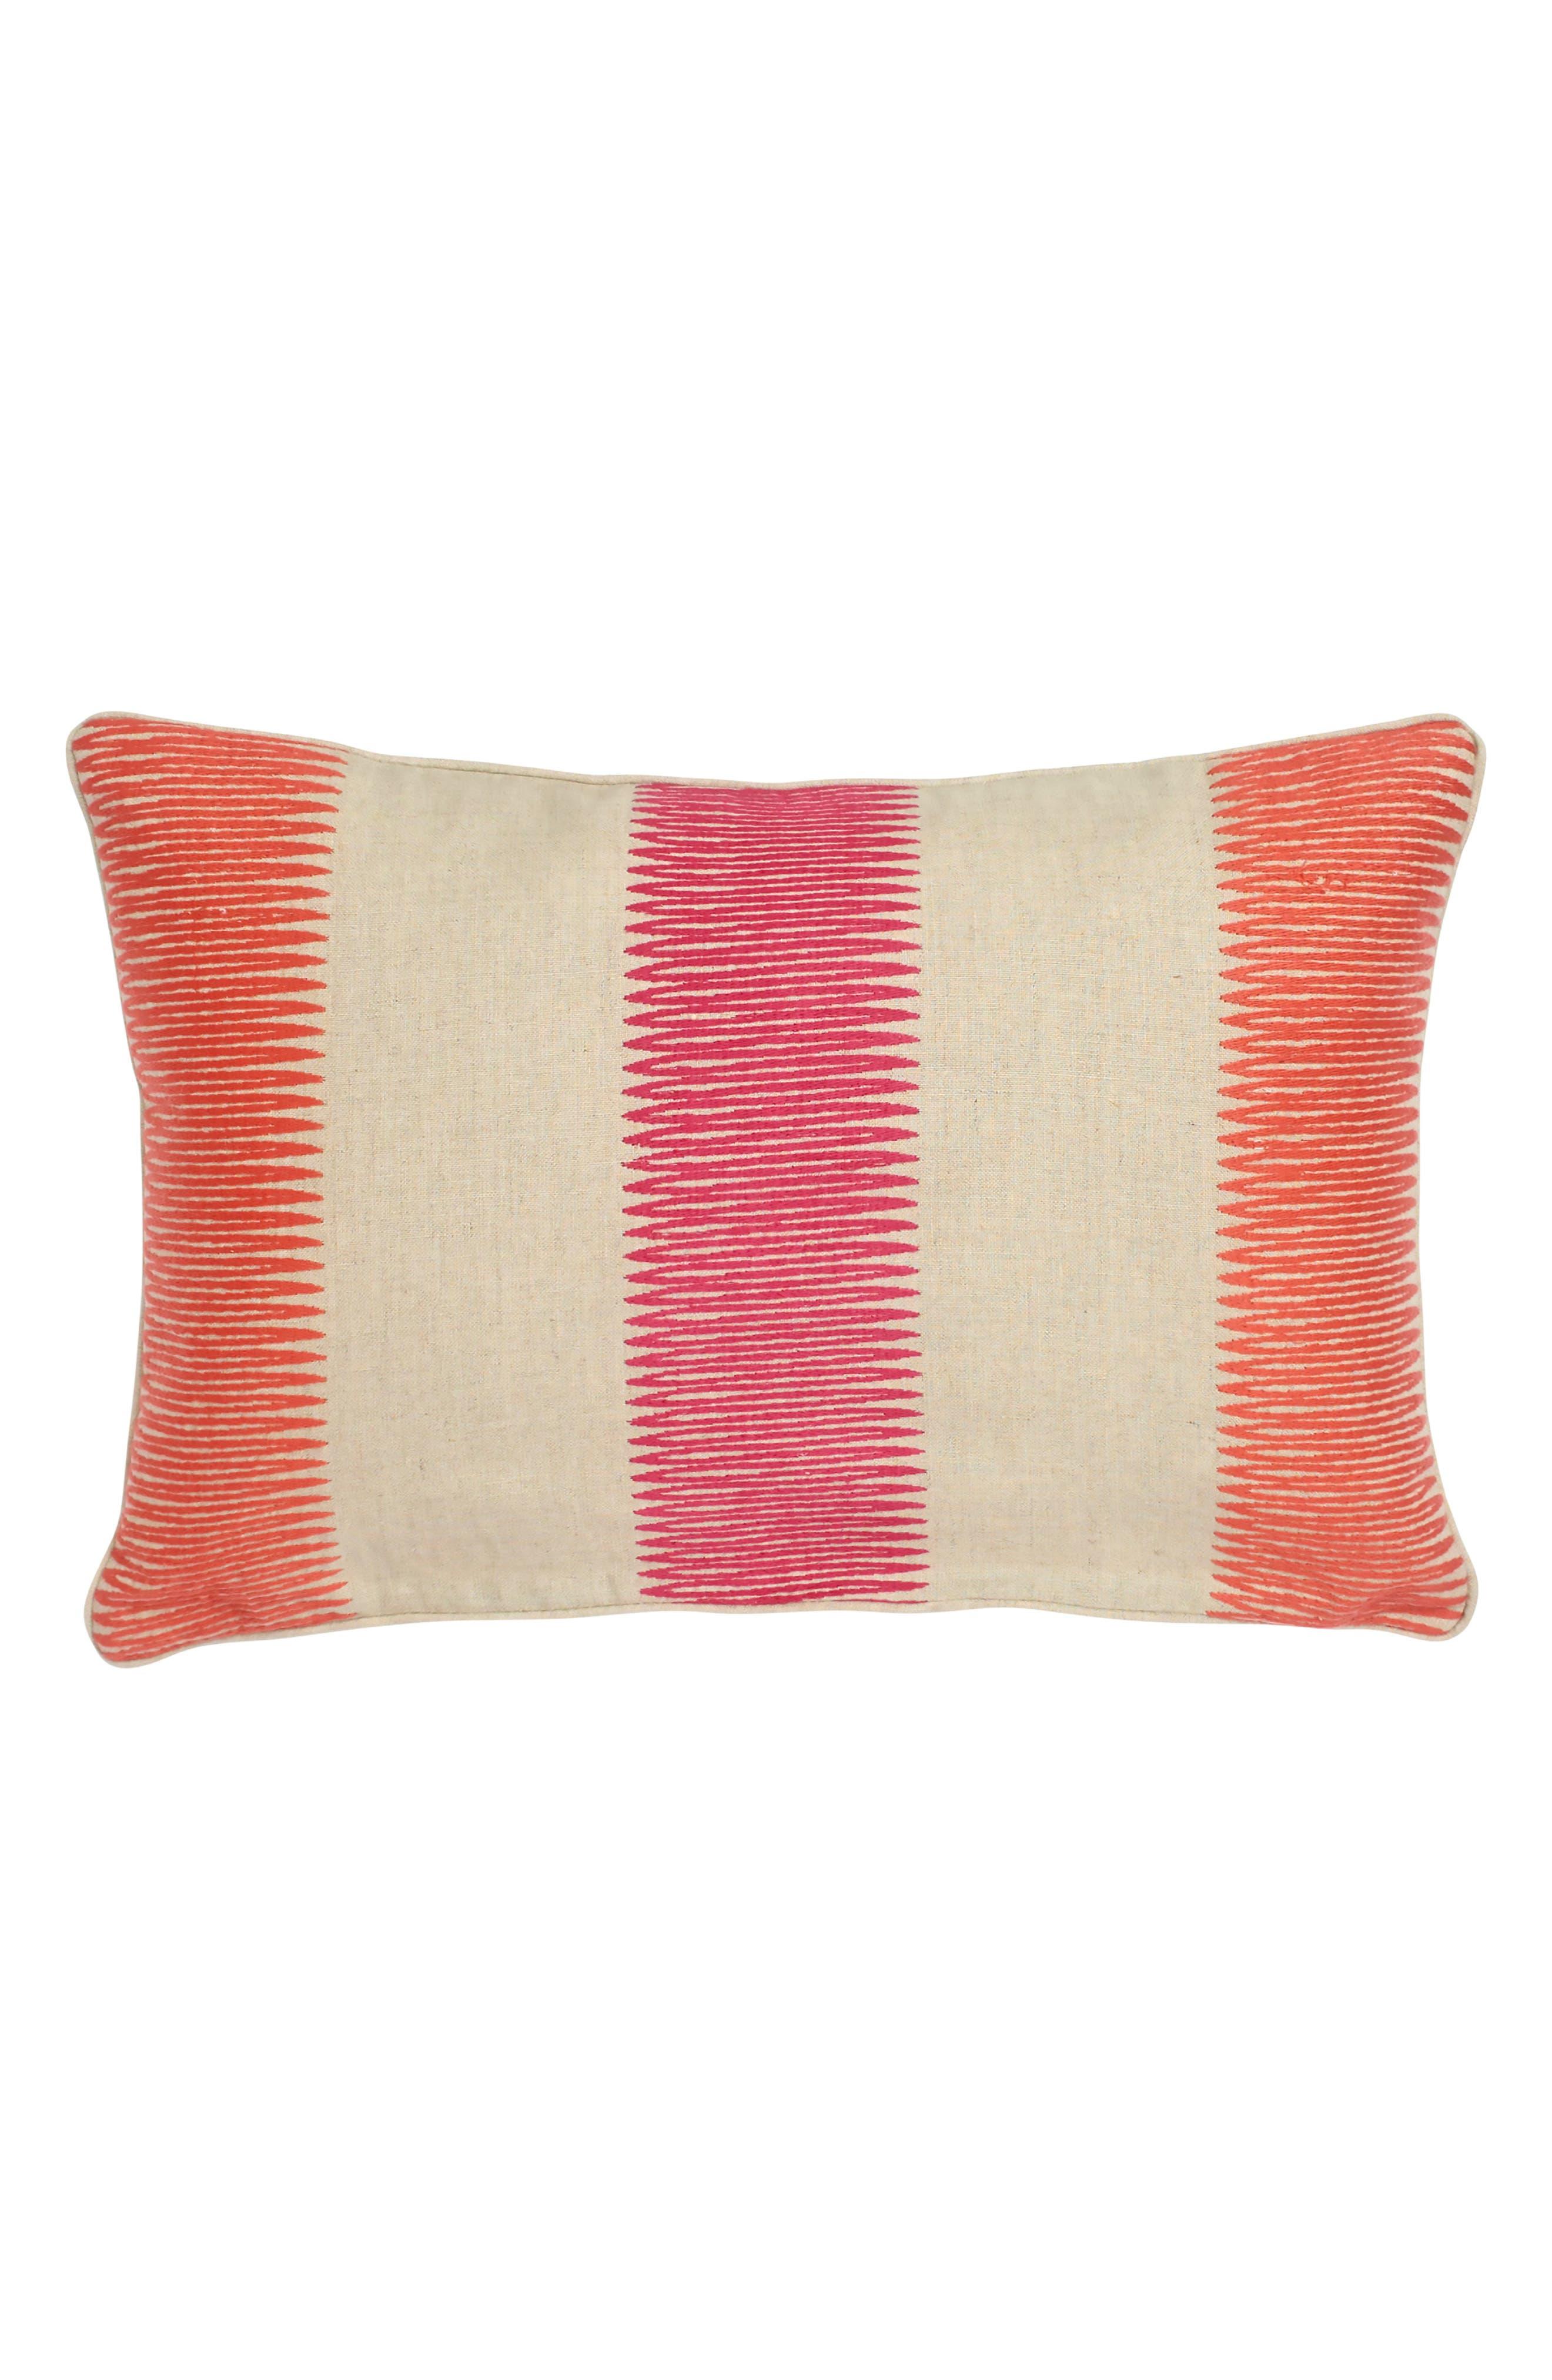 Amazilia Accent Pillow,                             Main thumbnail 1, color,                             TAUPE